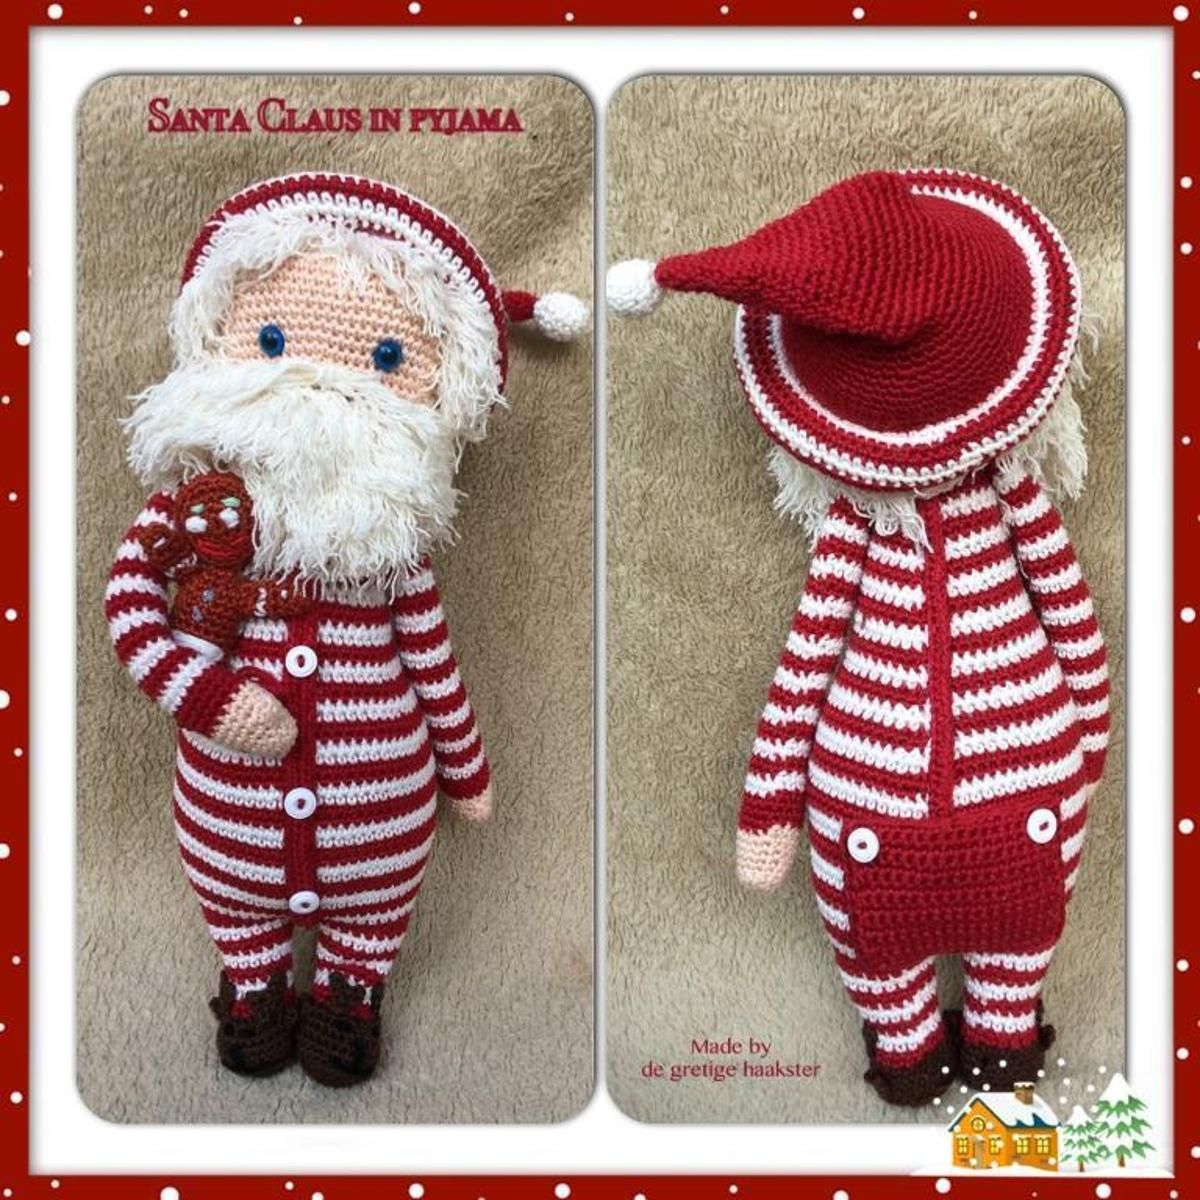 Santa in Pyjamas